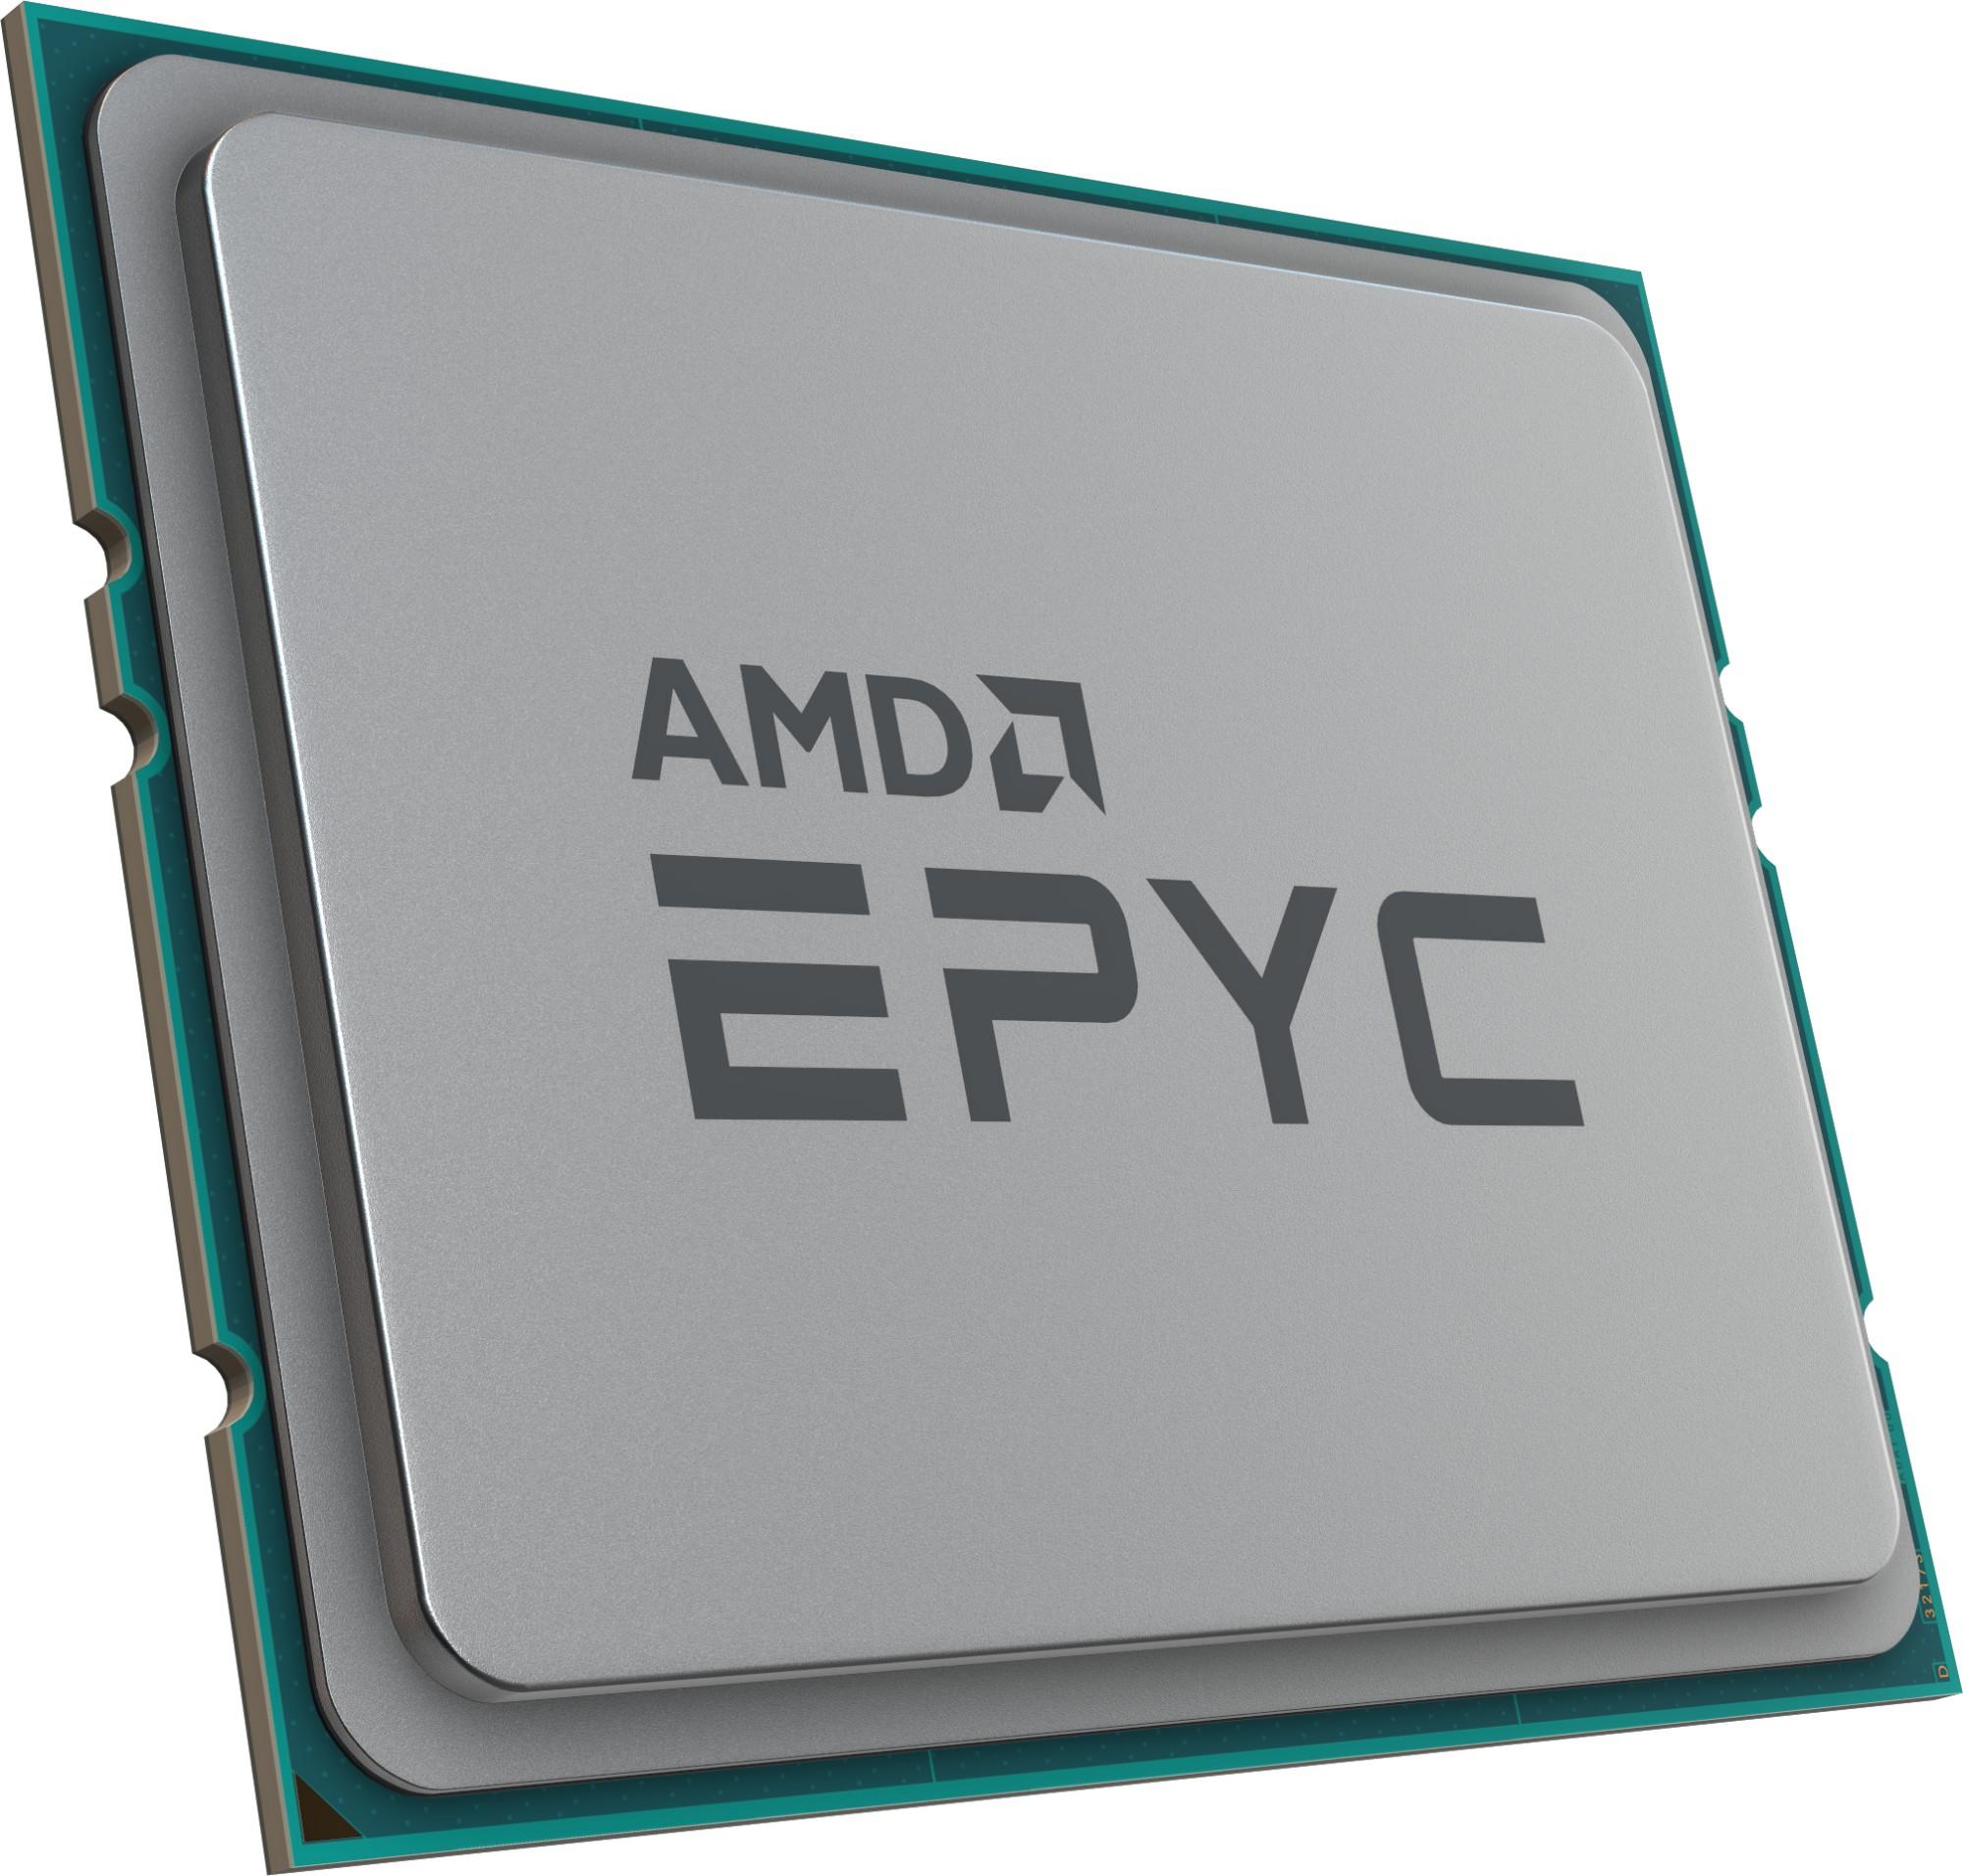 AMD EPYC 7302 processor 3 GHz 128 MB L3